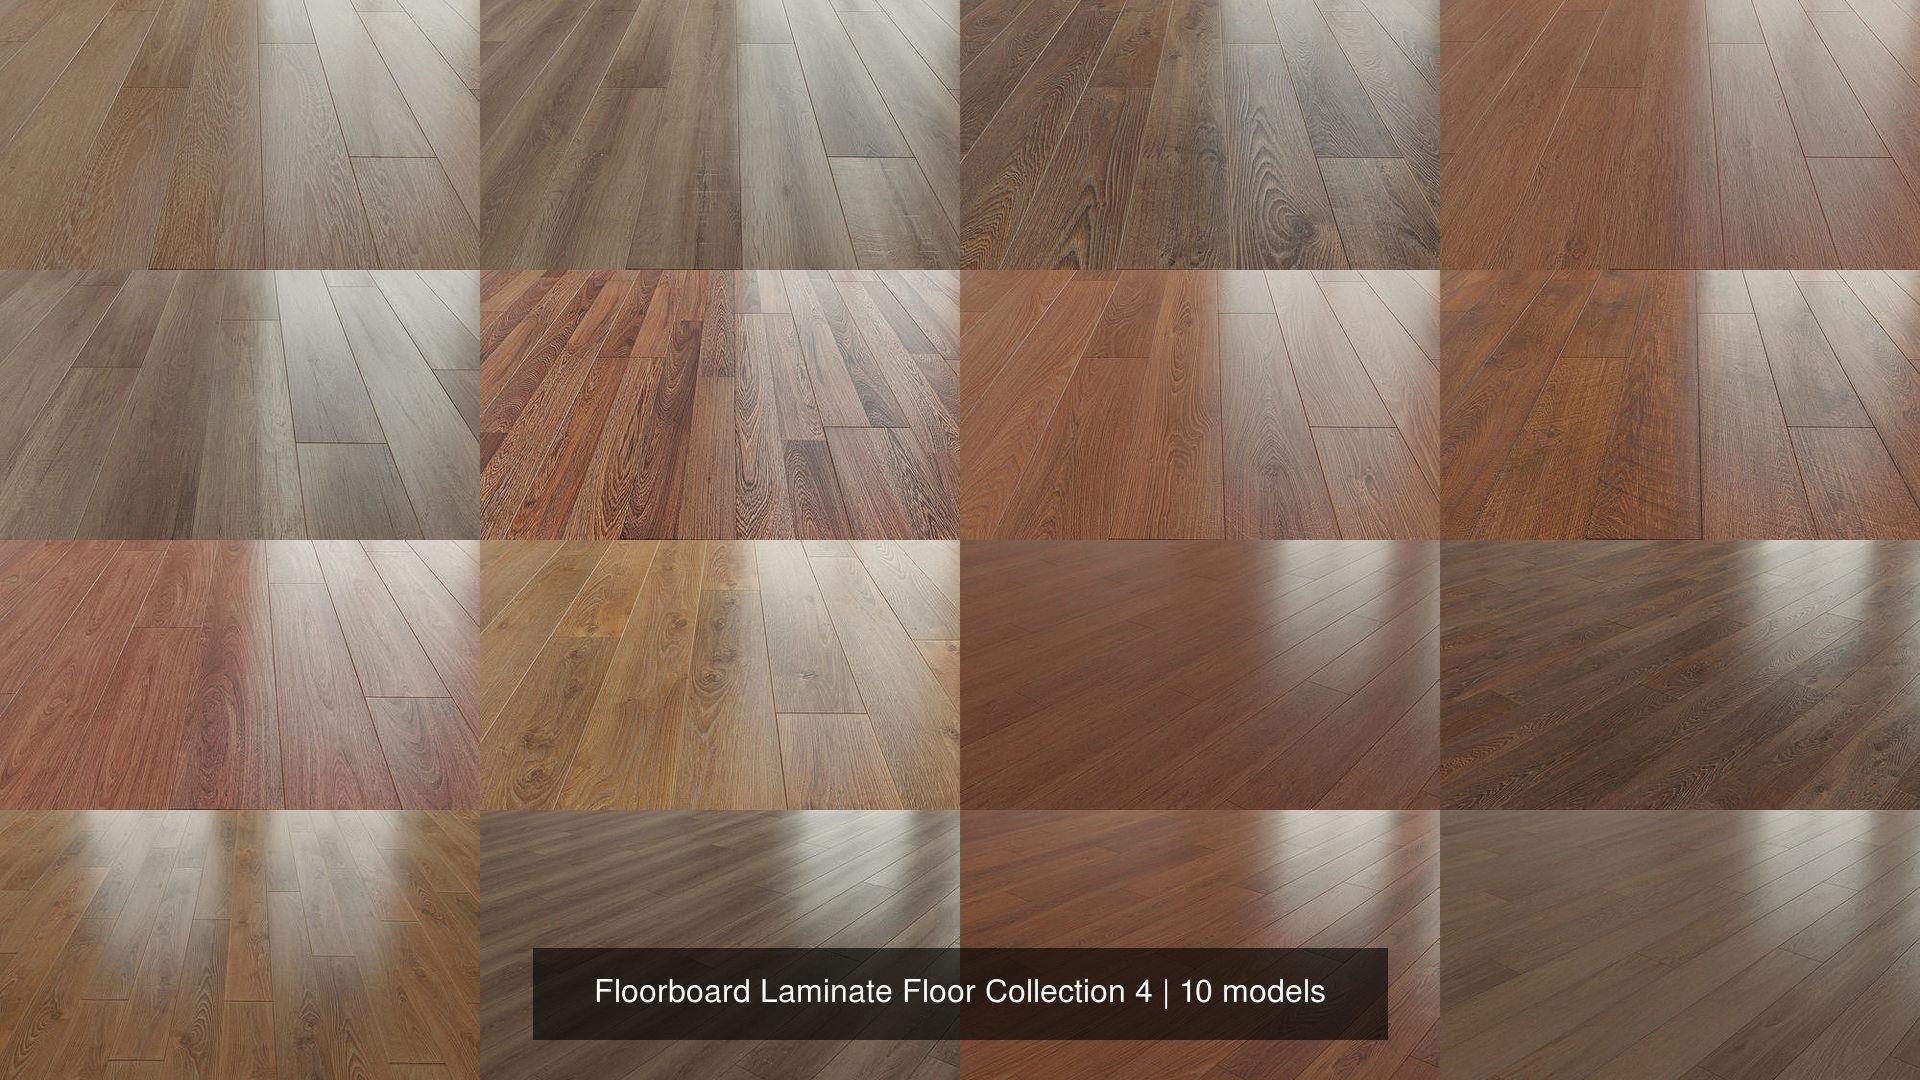 Floorboard Laminate Floor Collection 4, 3d Printed Laminate Flooring